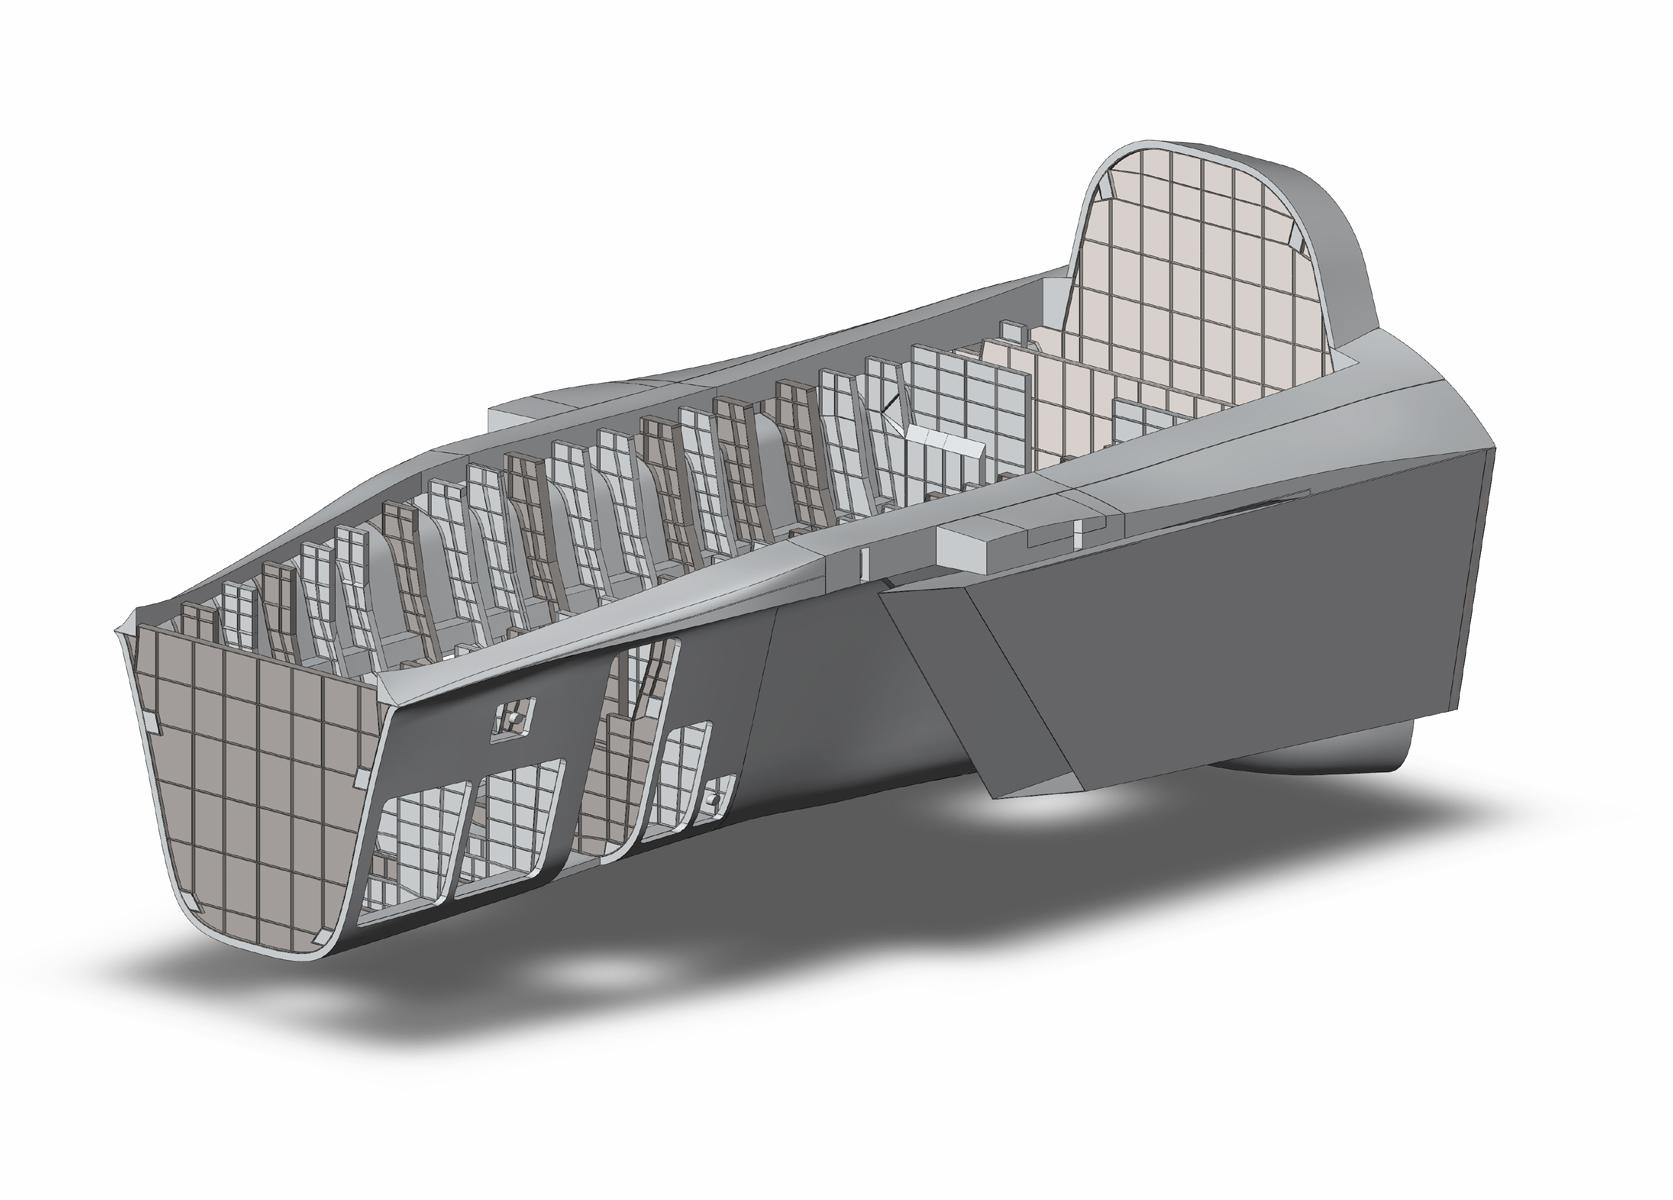 Stavatti, SM-28, Machete, Fuselage, Close Air Support, CAS